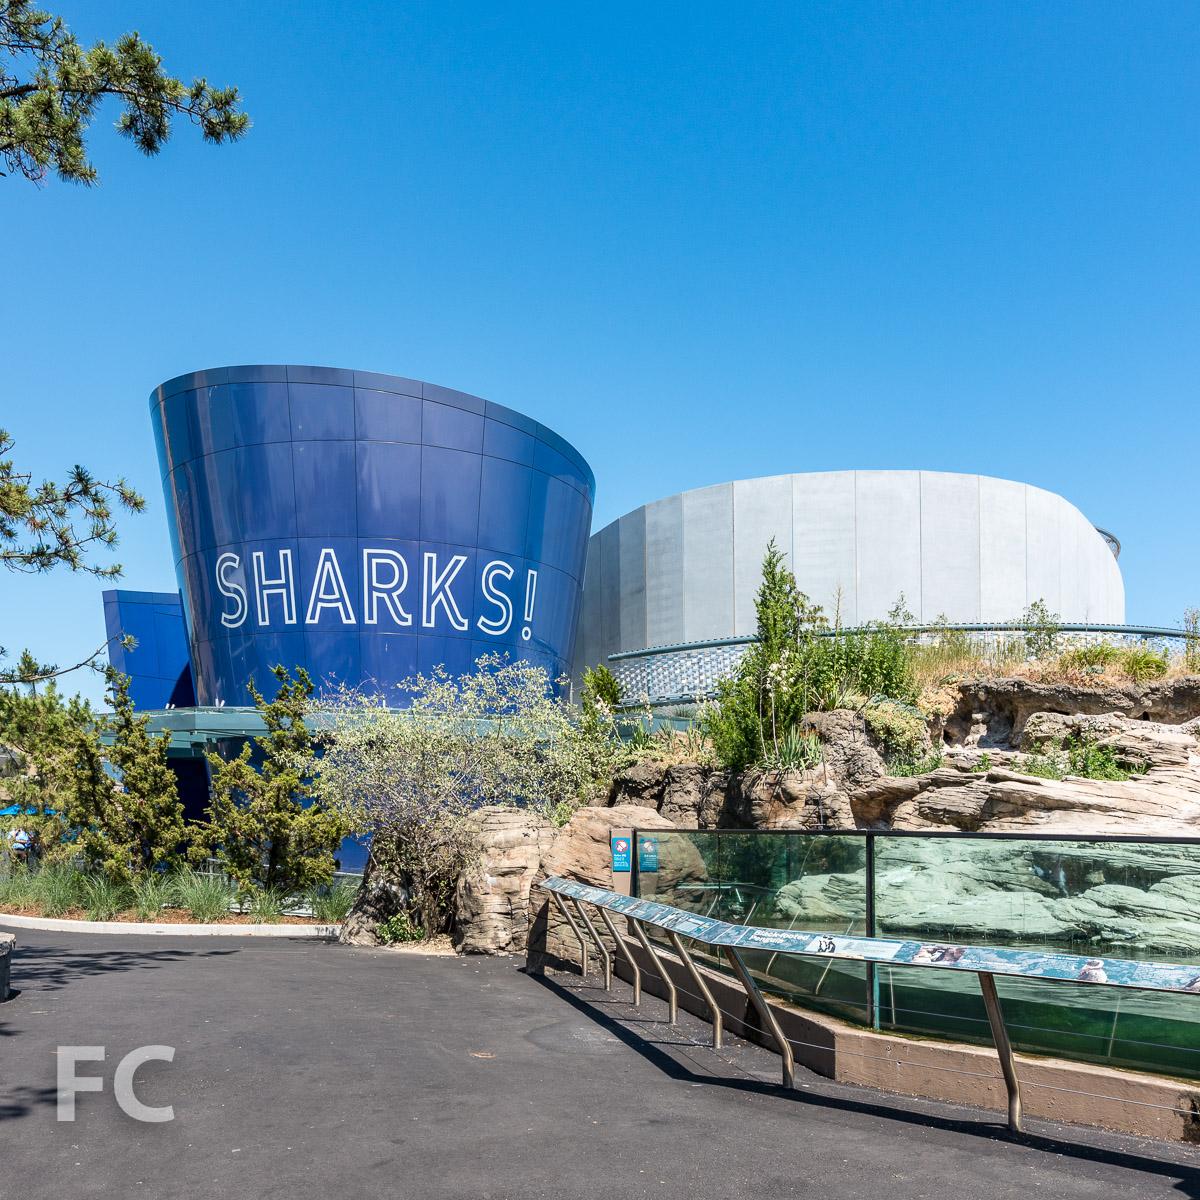 2018_07_05-NY Aquarium-DSC03467-2.jpg